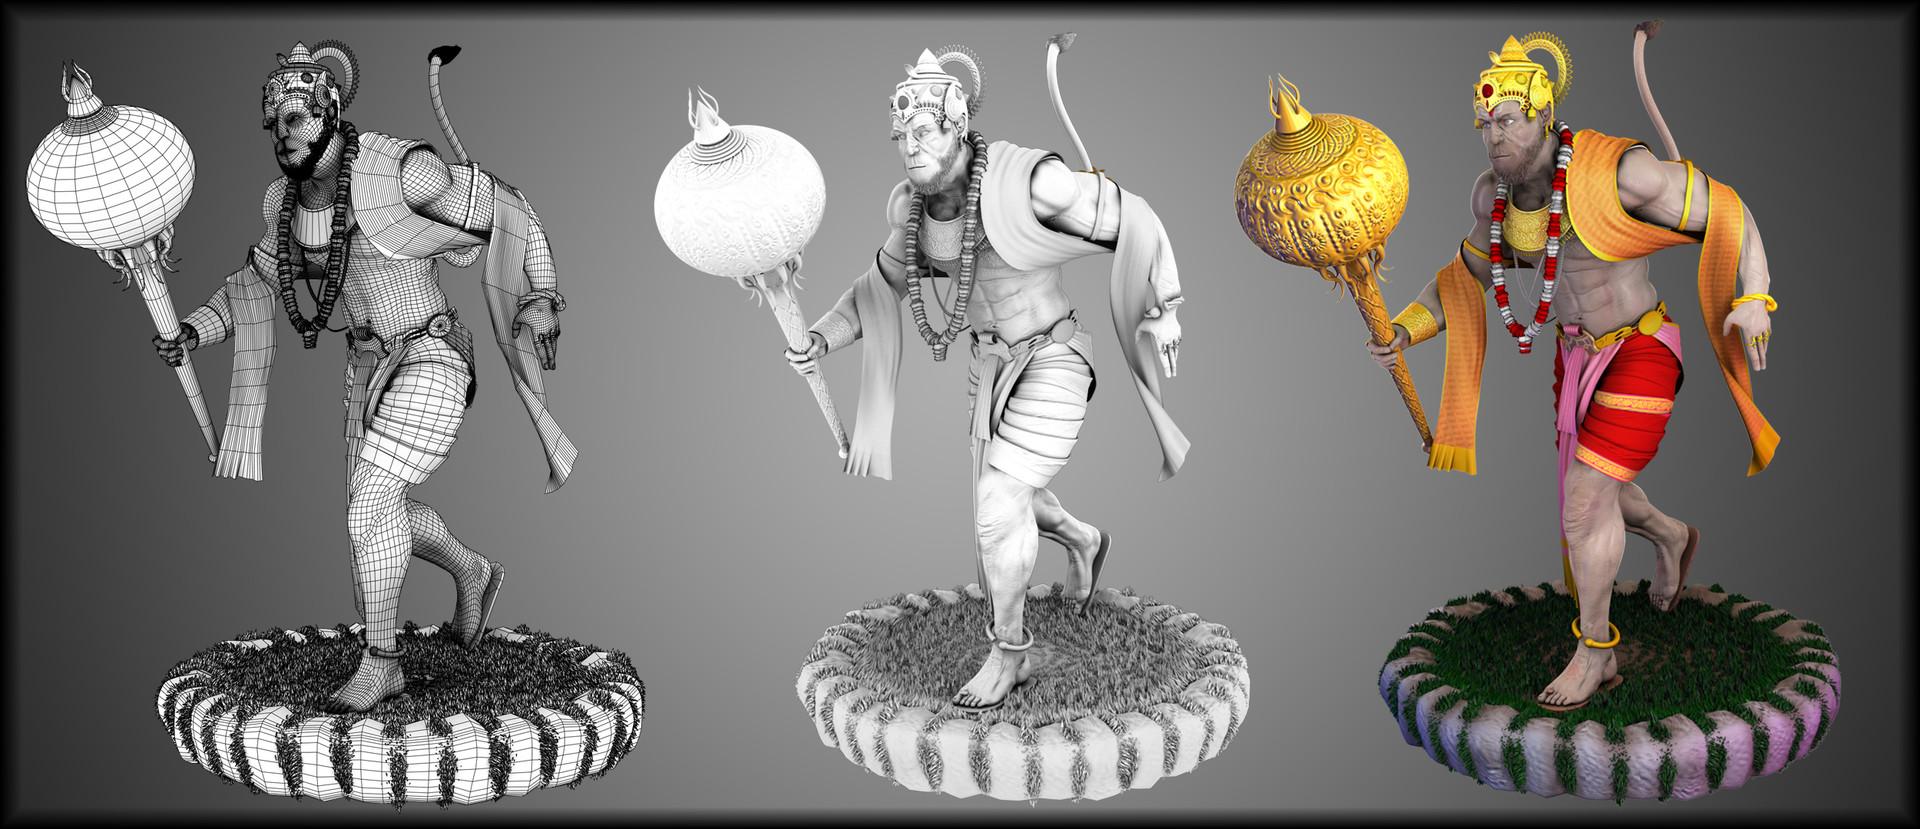 Devesh arvind nigam lord hanuman 1